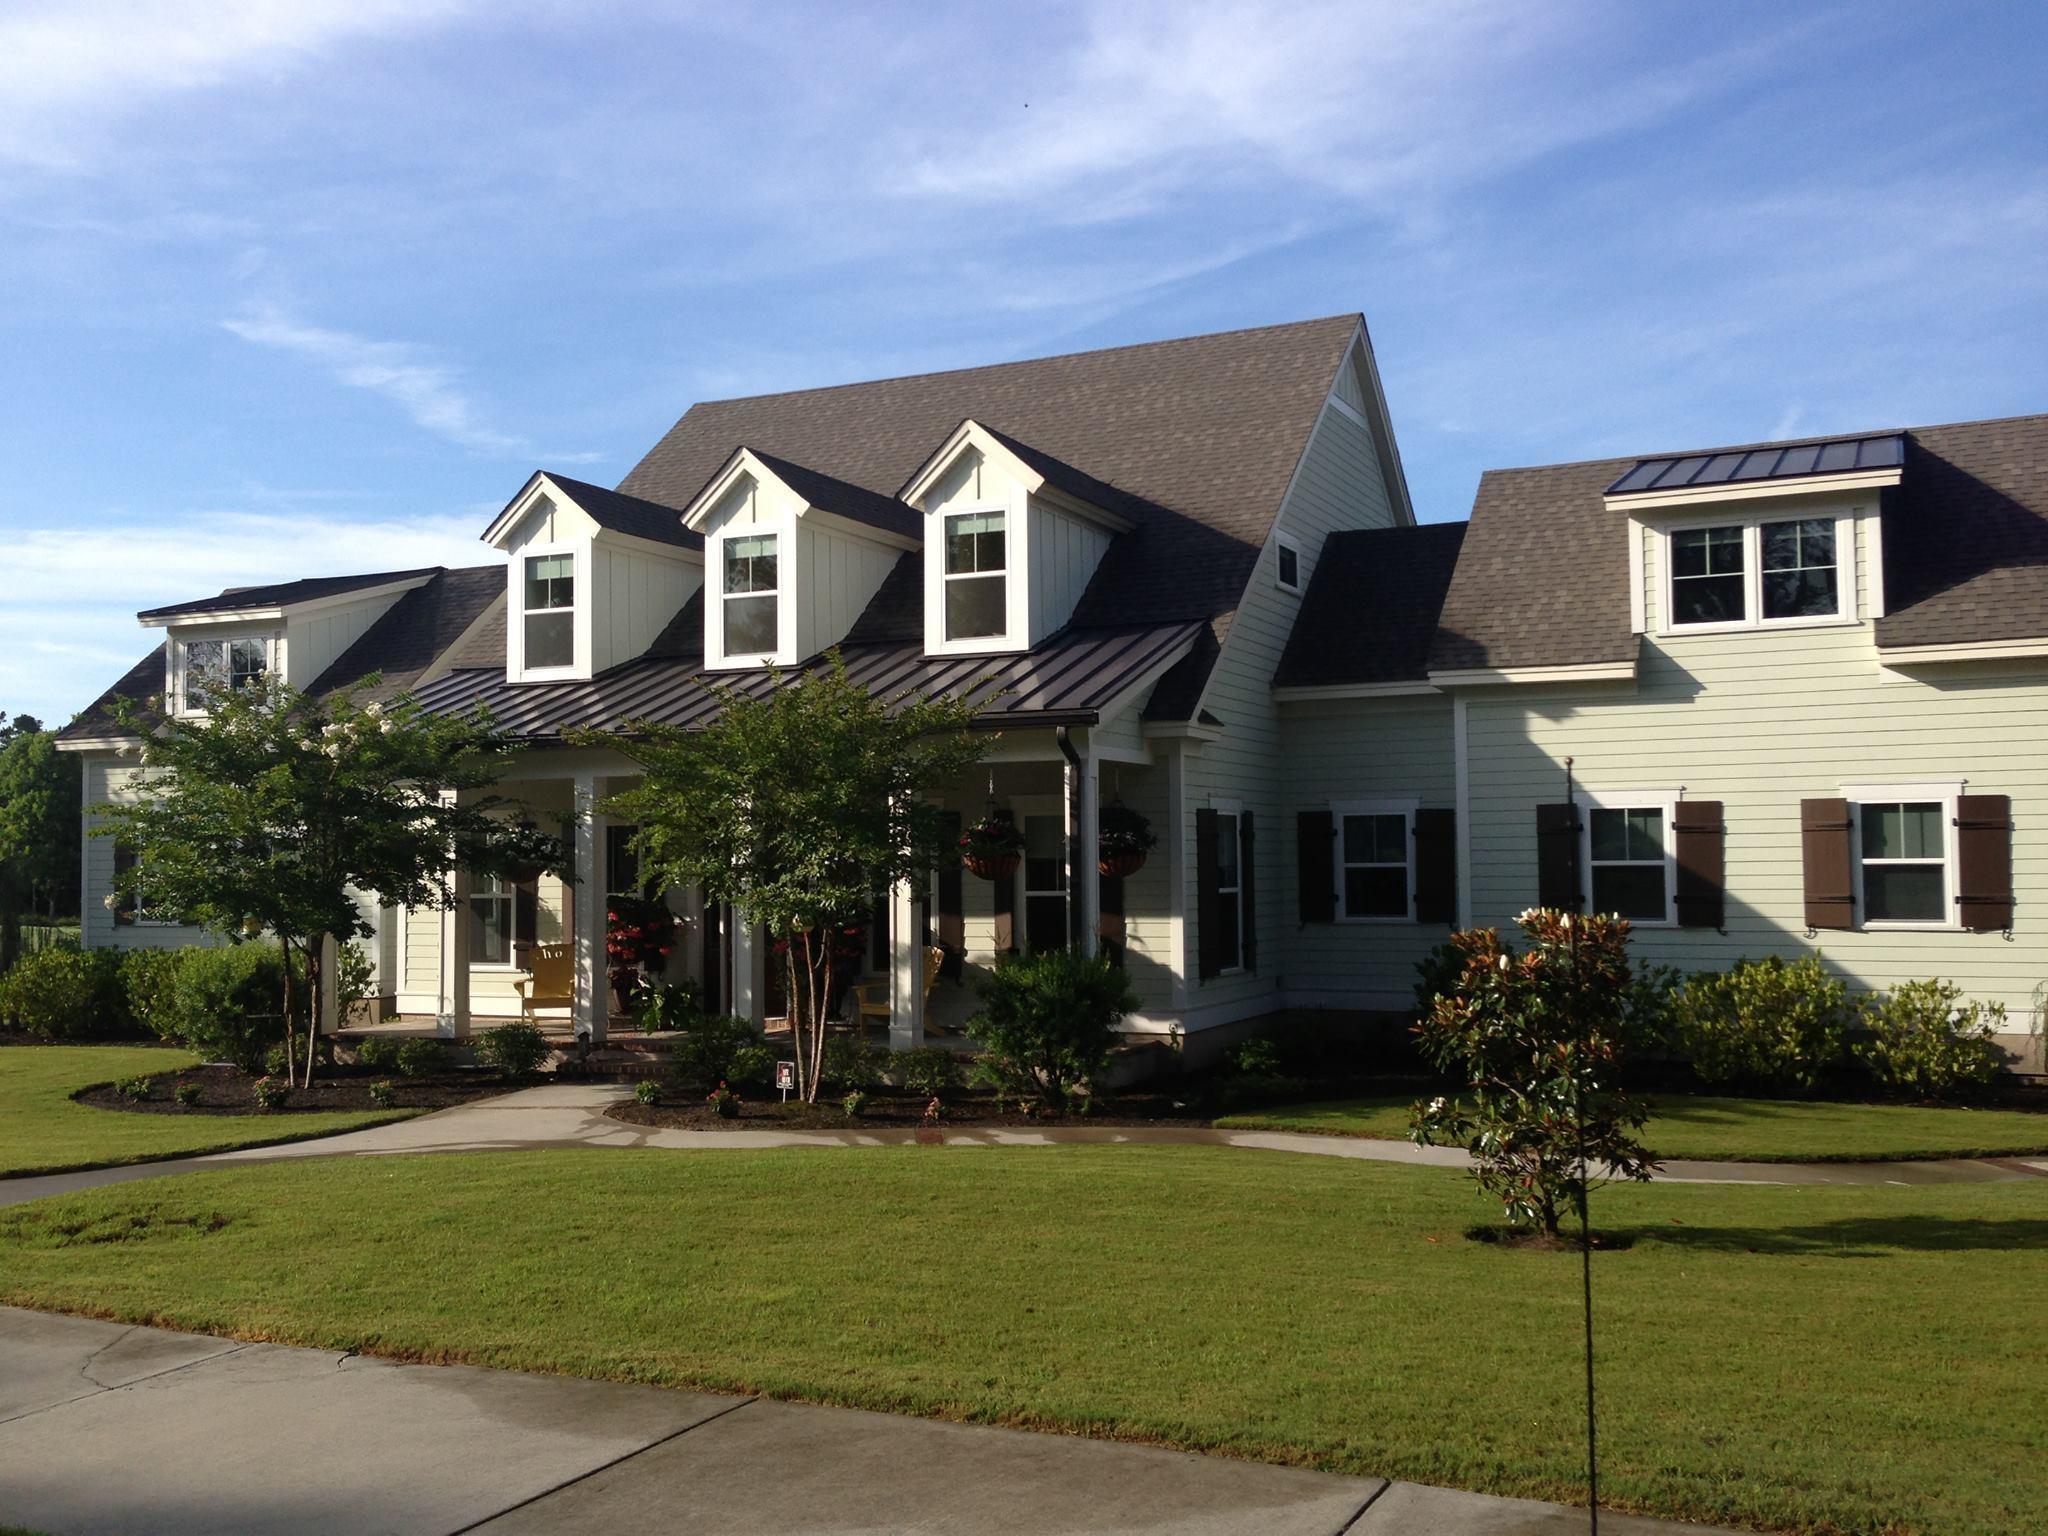 RoofCrafters-Savannah image 95